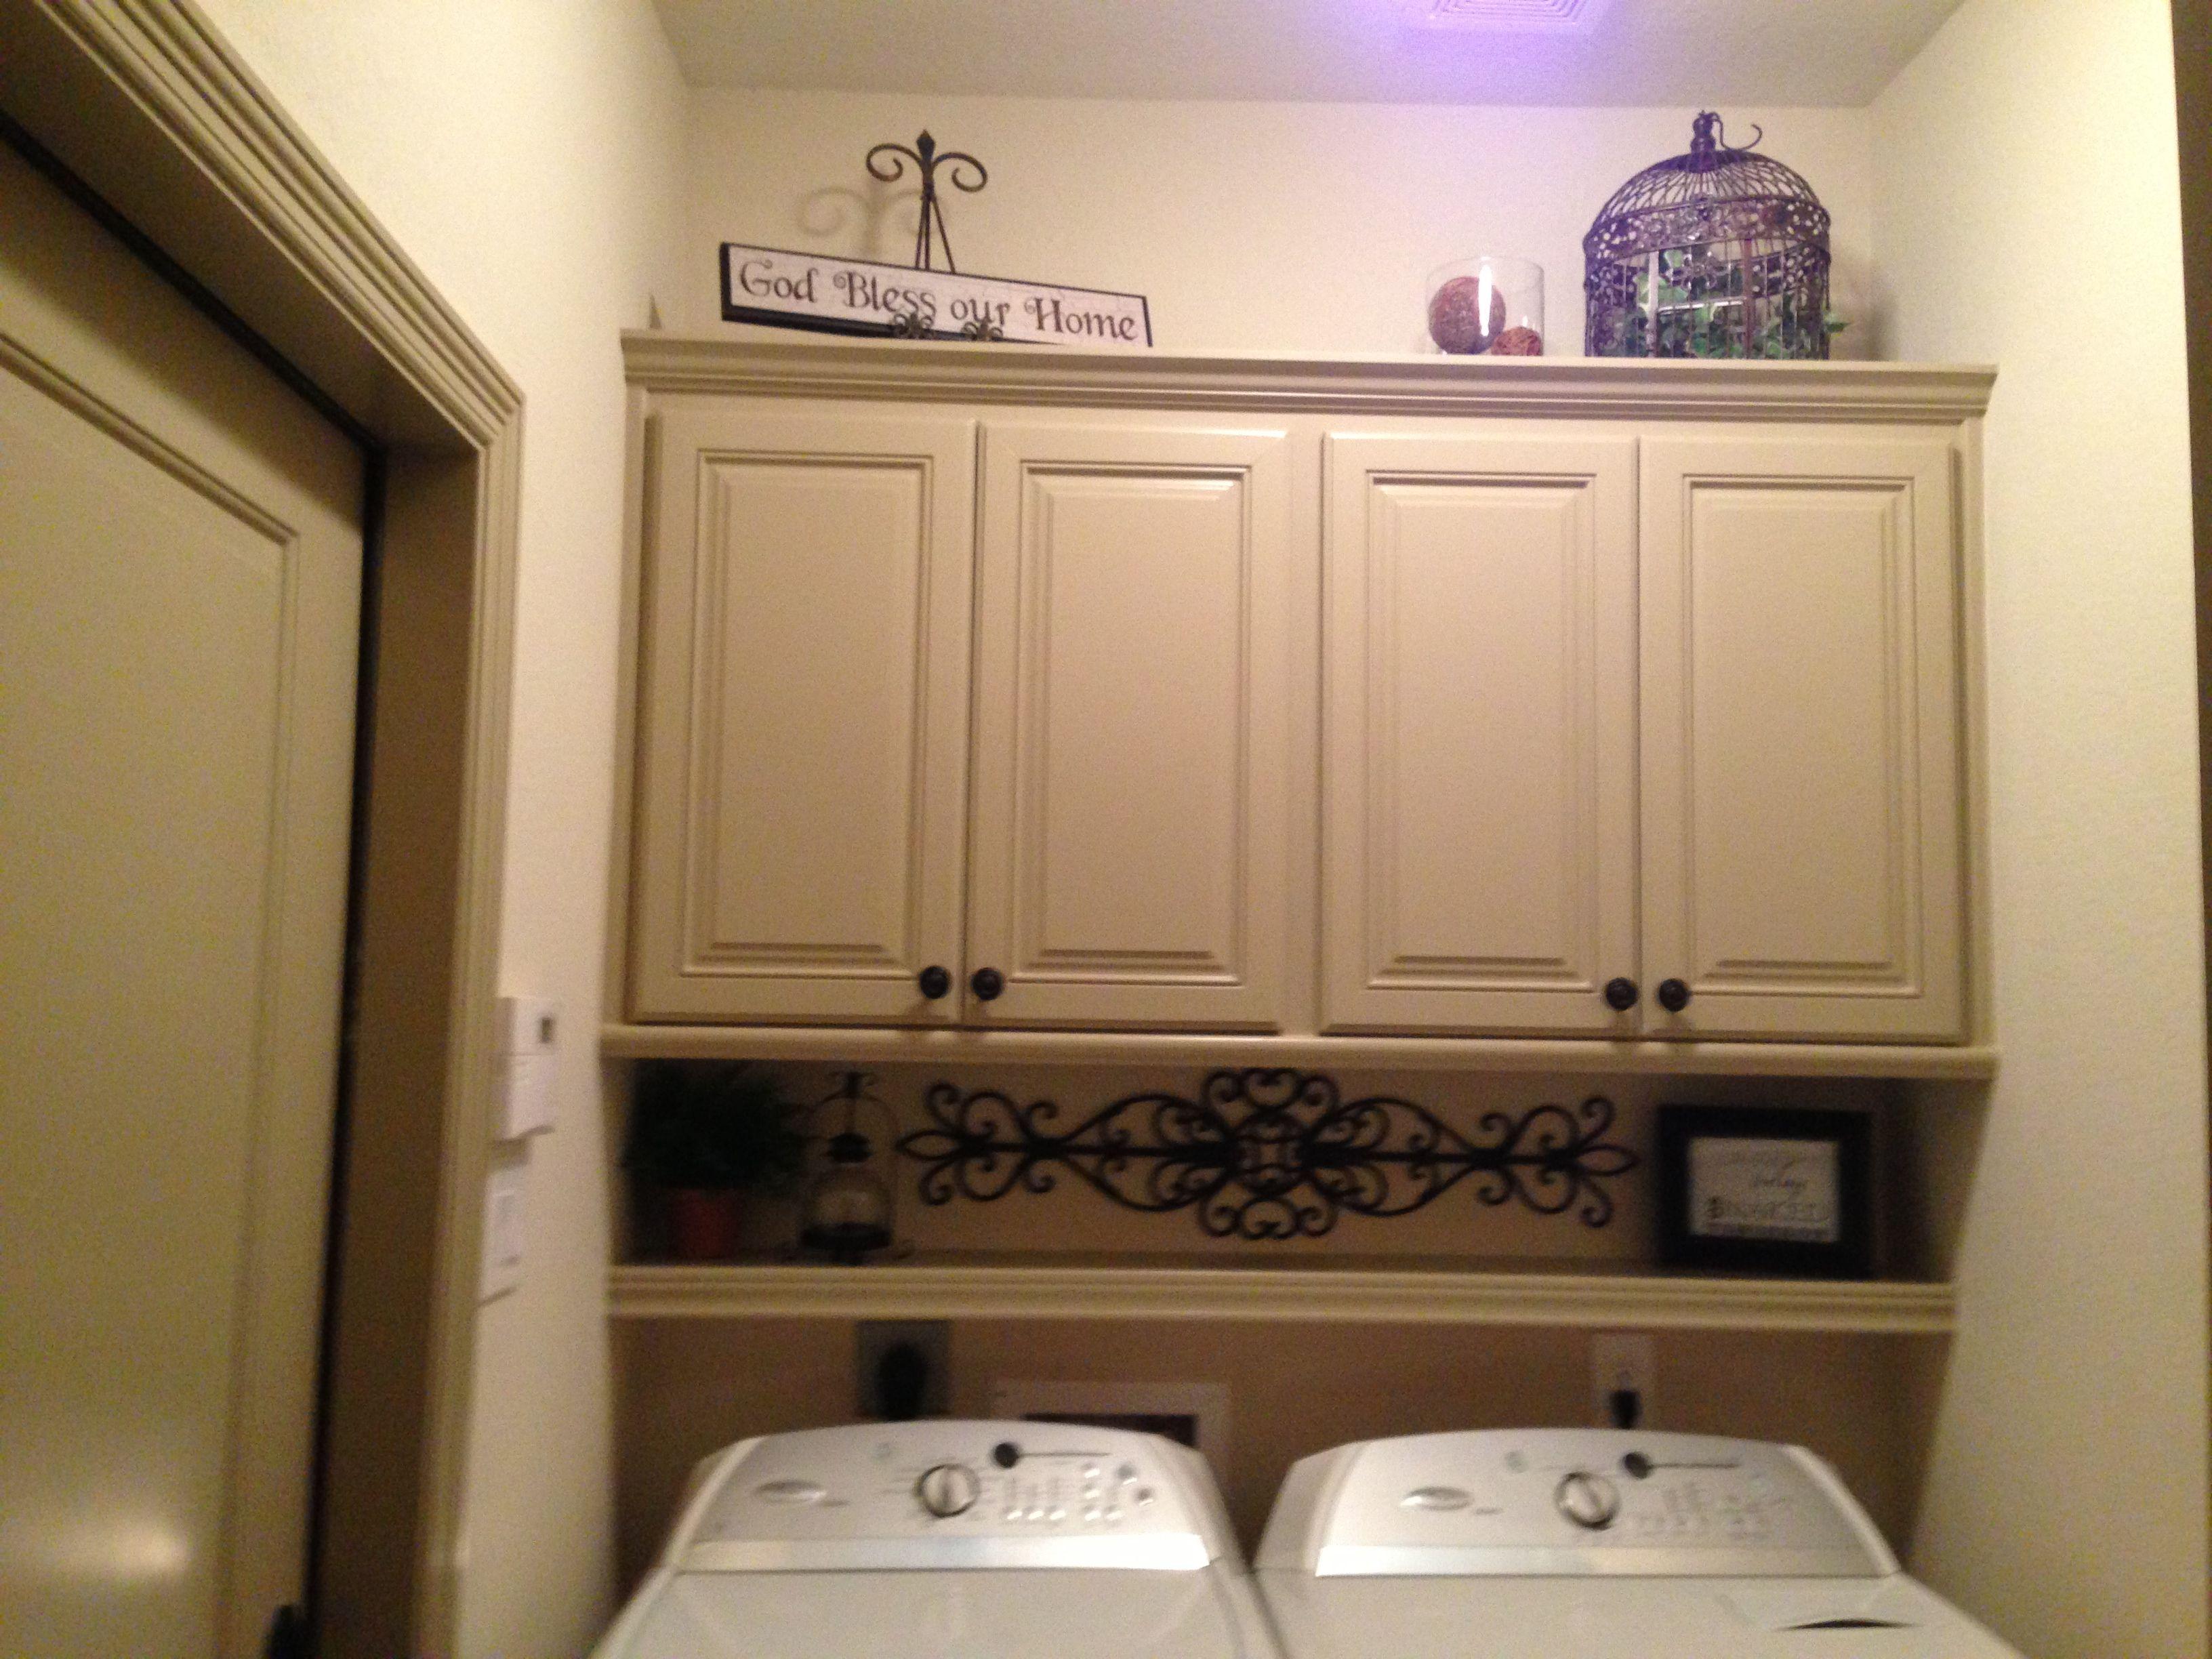 Diy Shelf Above Washer Dryer Handyhusband Diy Shelves Home